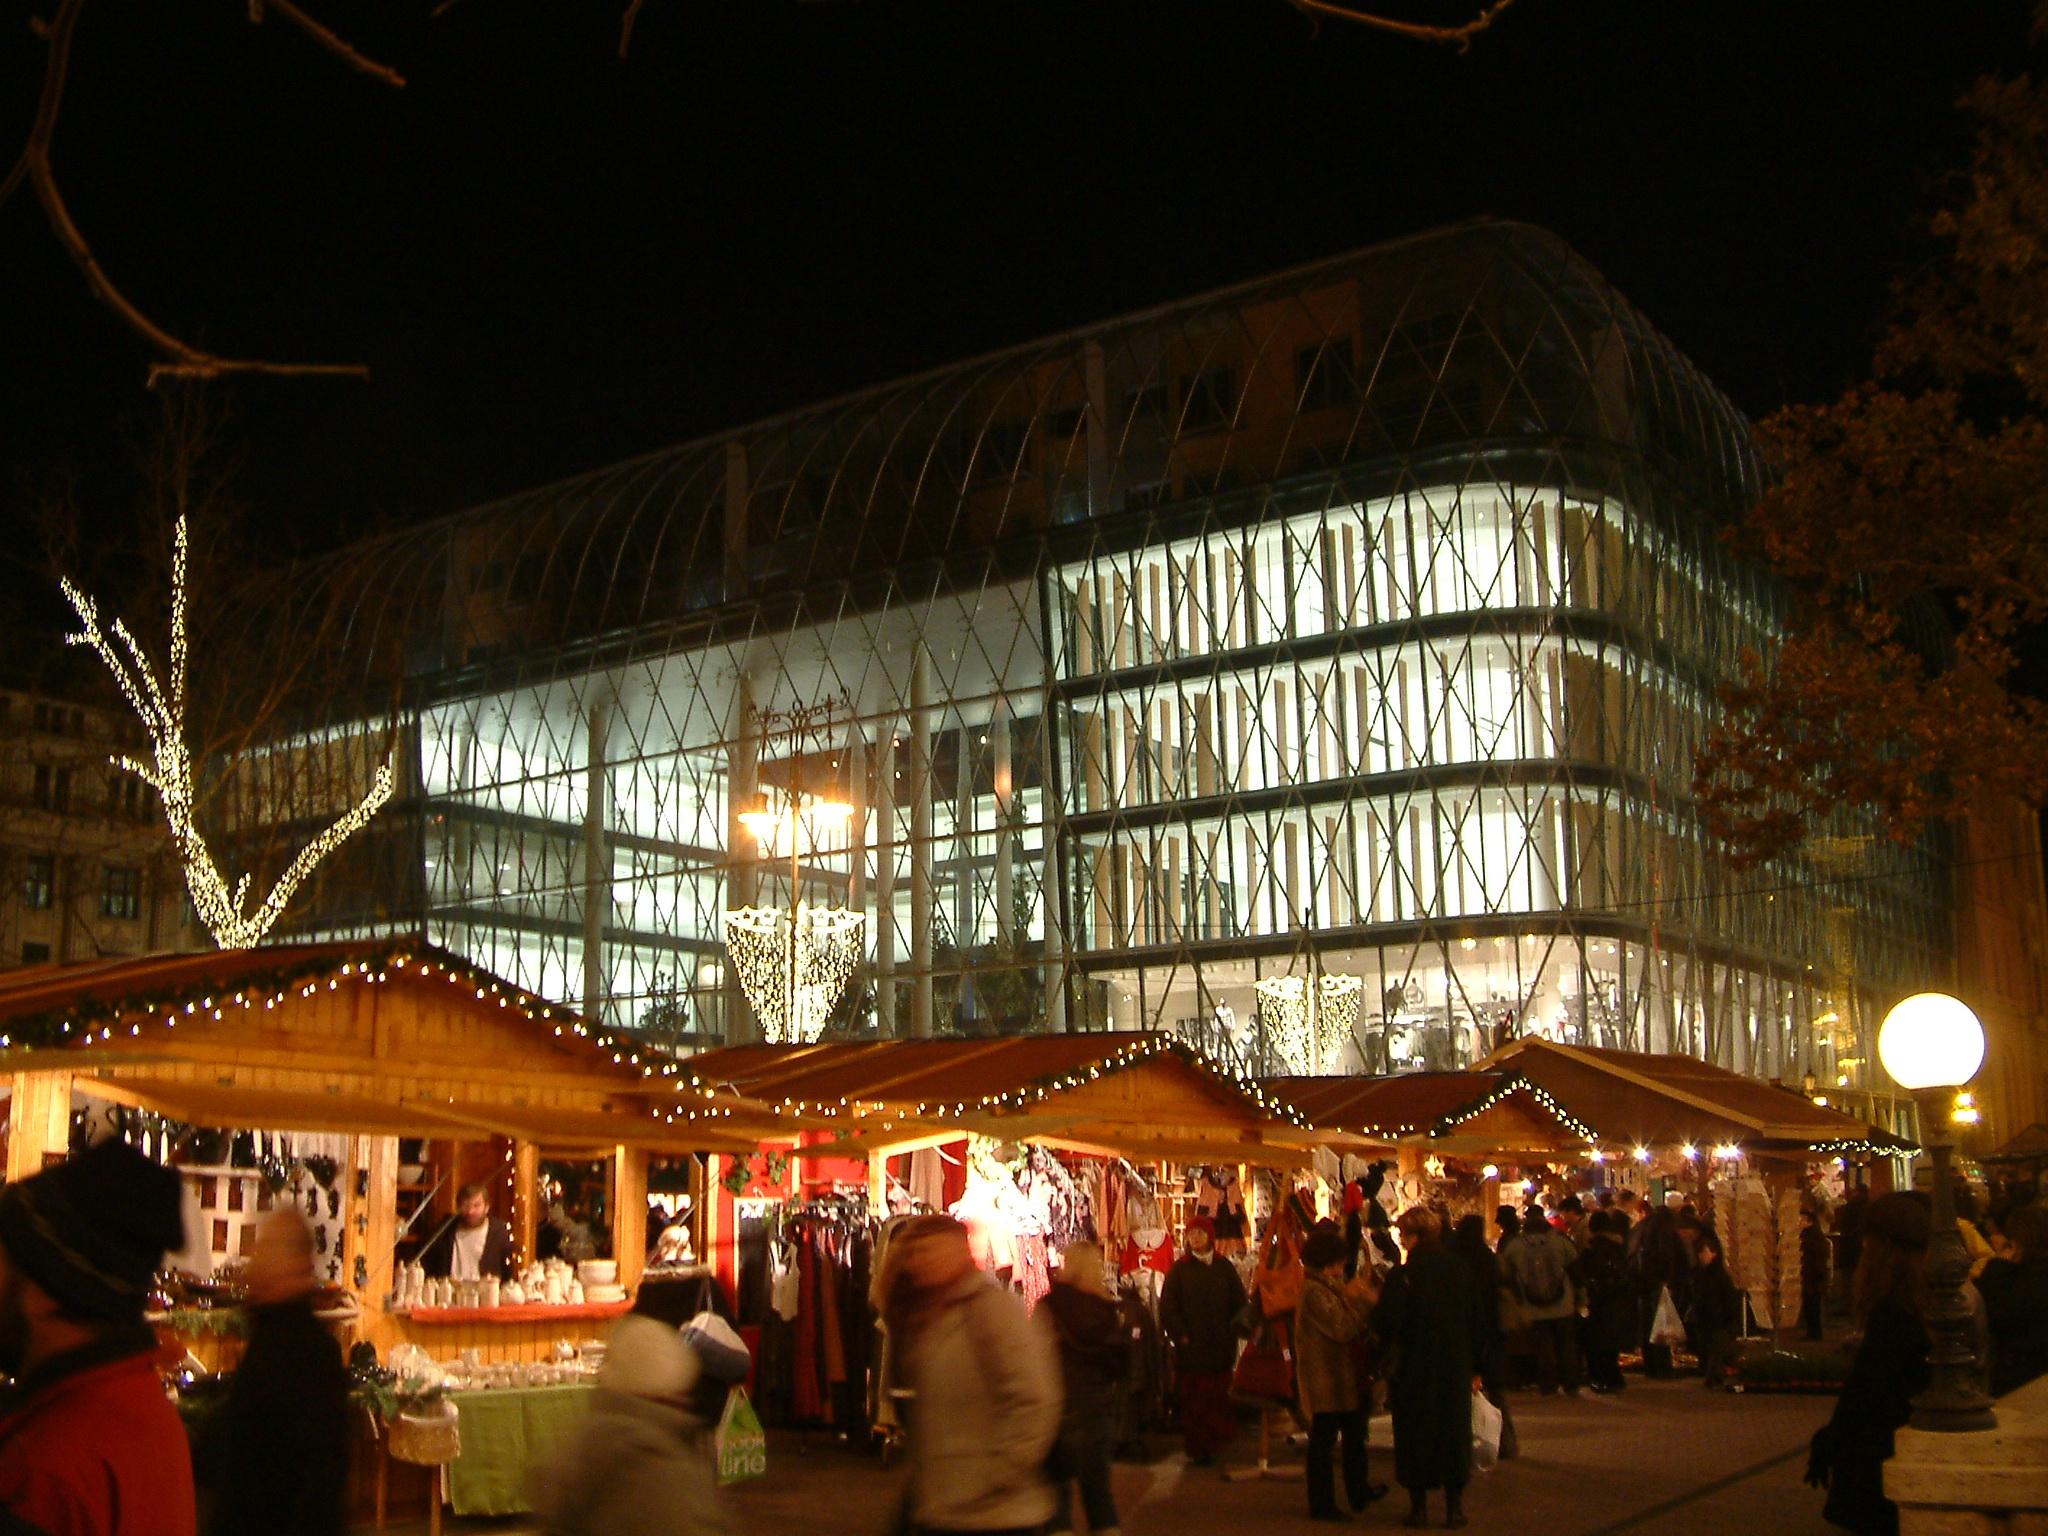 Vorosmarty Square Budapest Christmas Market.File Christmas Market At Vorosmarty Square Budapest Jpg